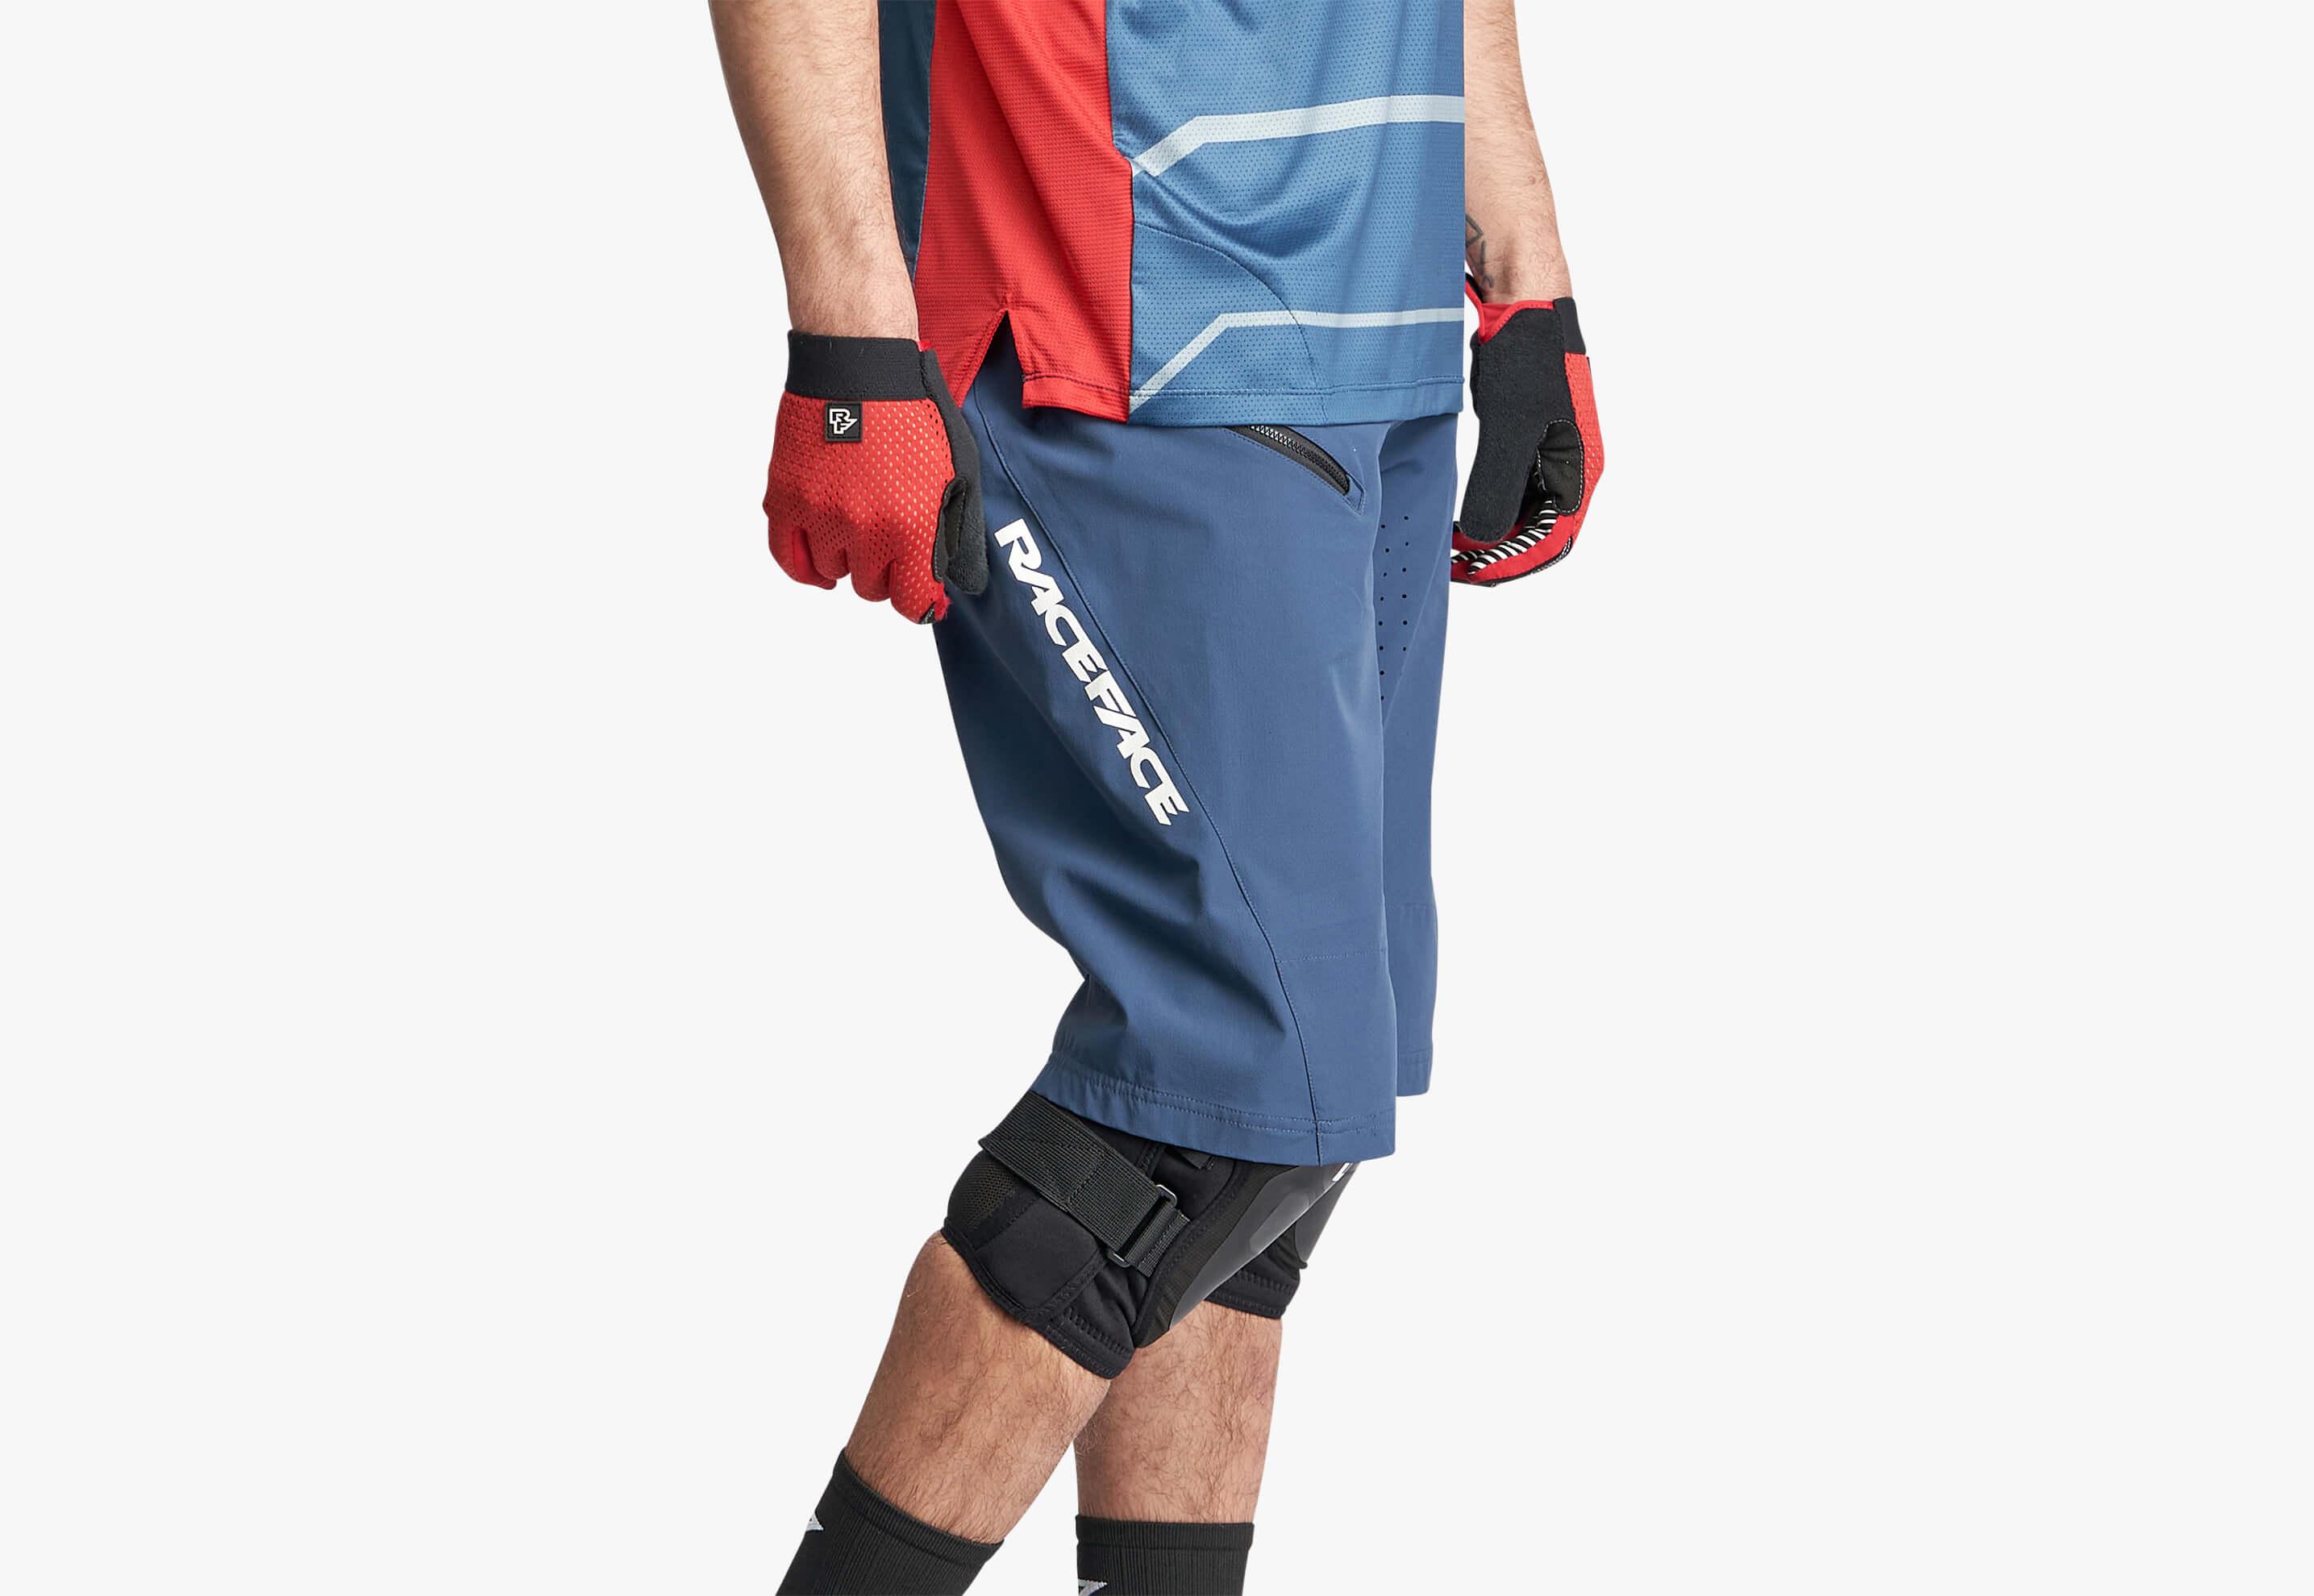 Indy Shorts - Men's